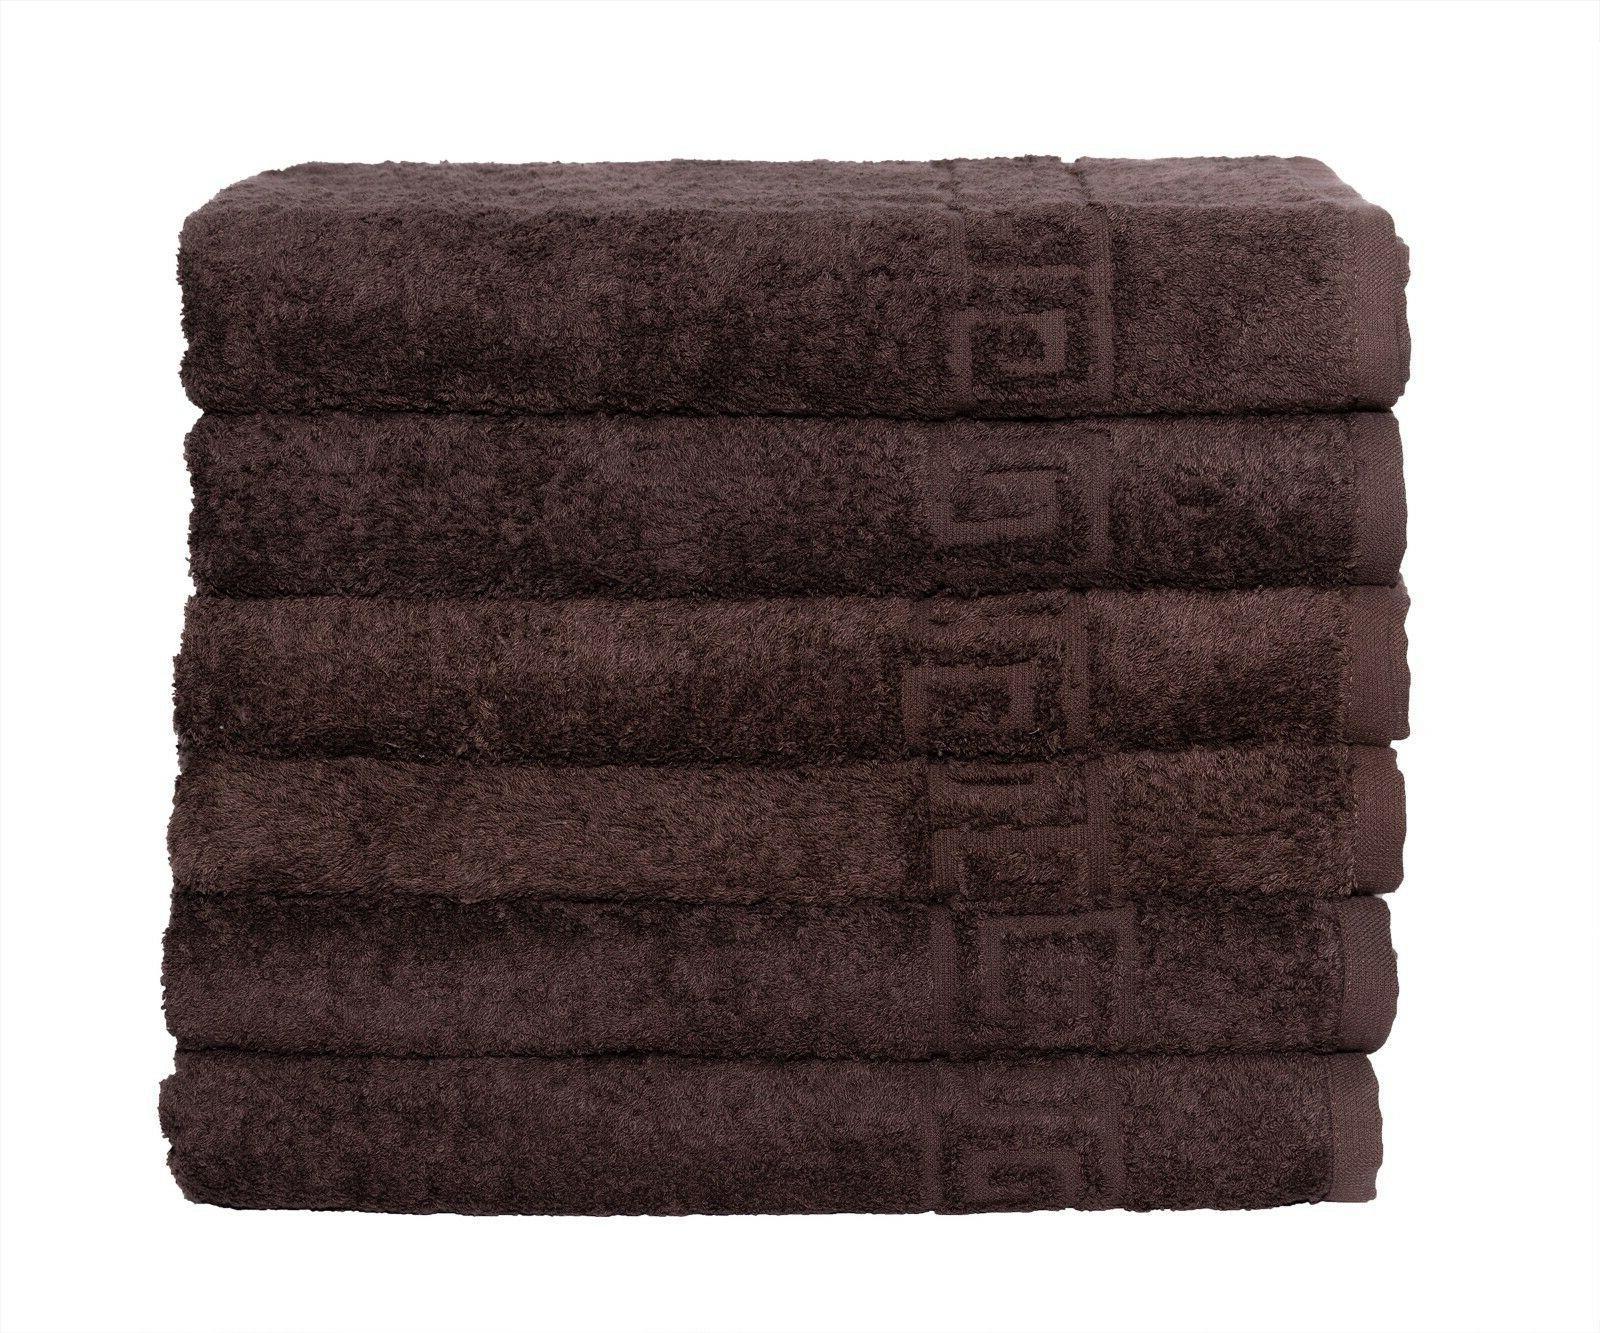 6 Pieces or 6 pcc Bath for - cotton Soft Luxury